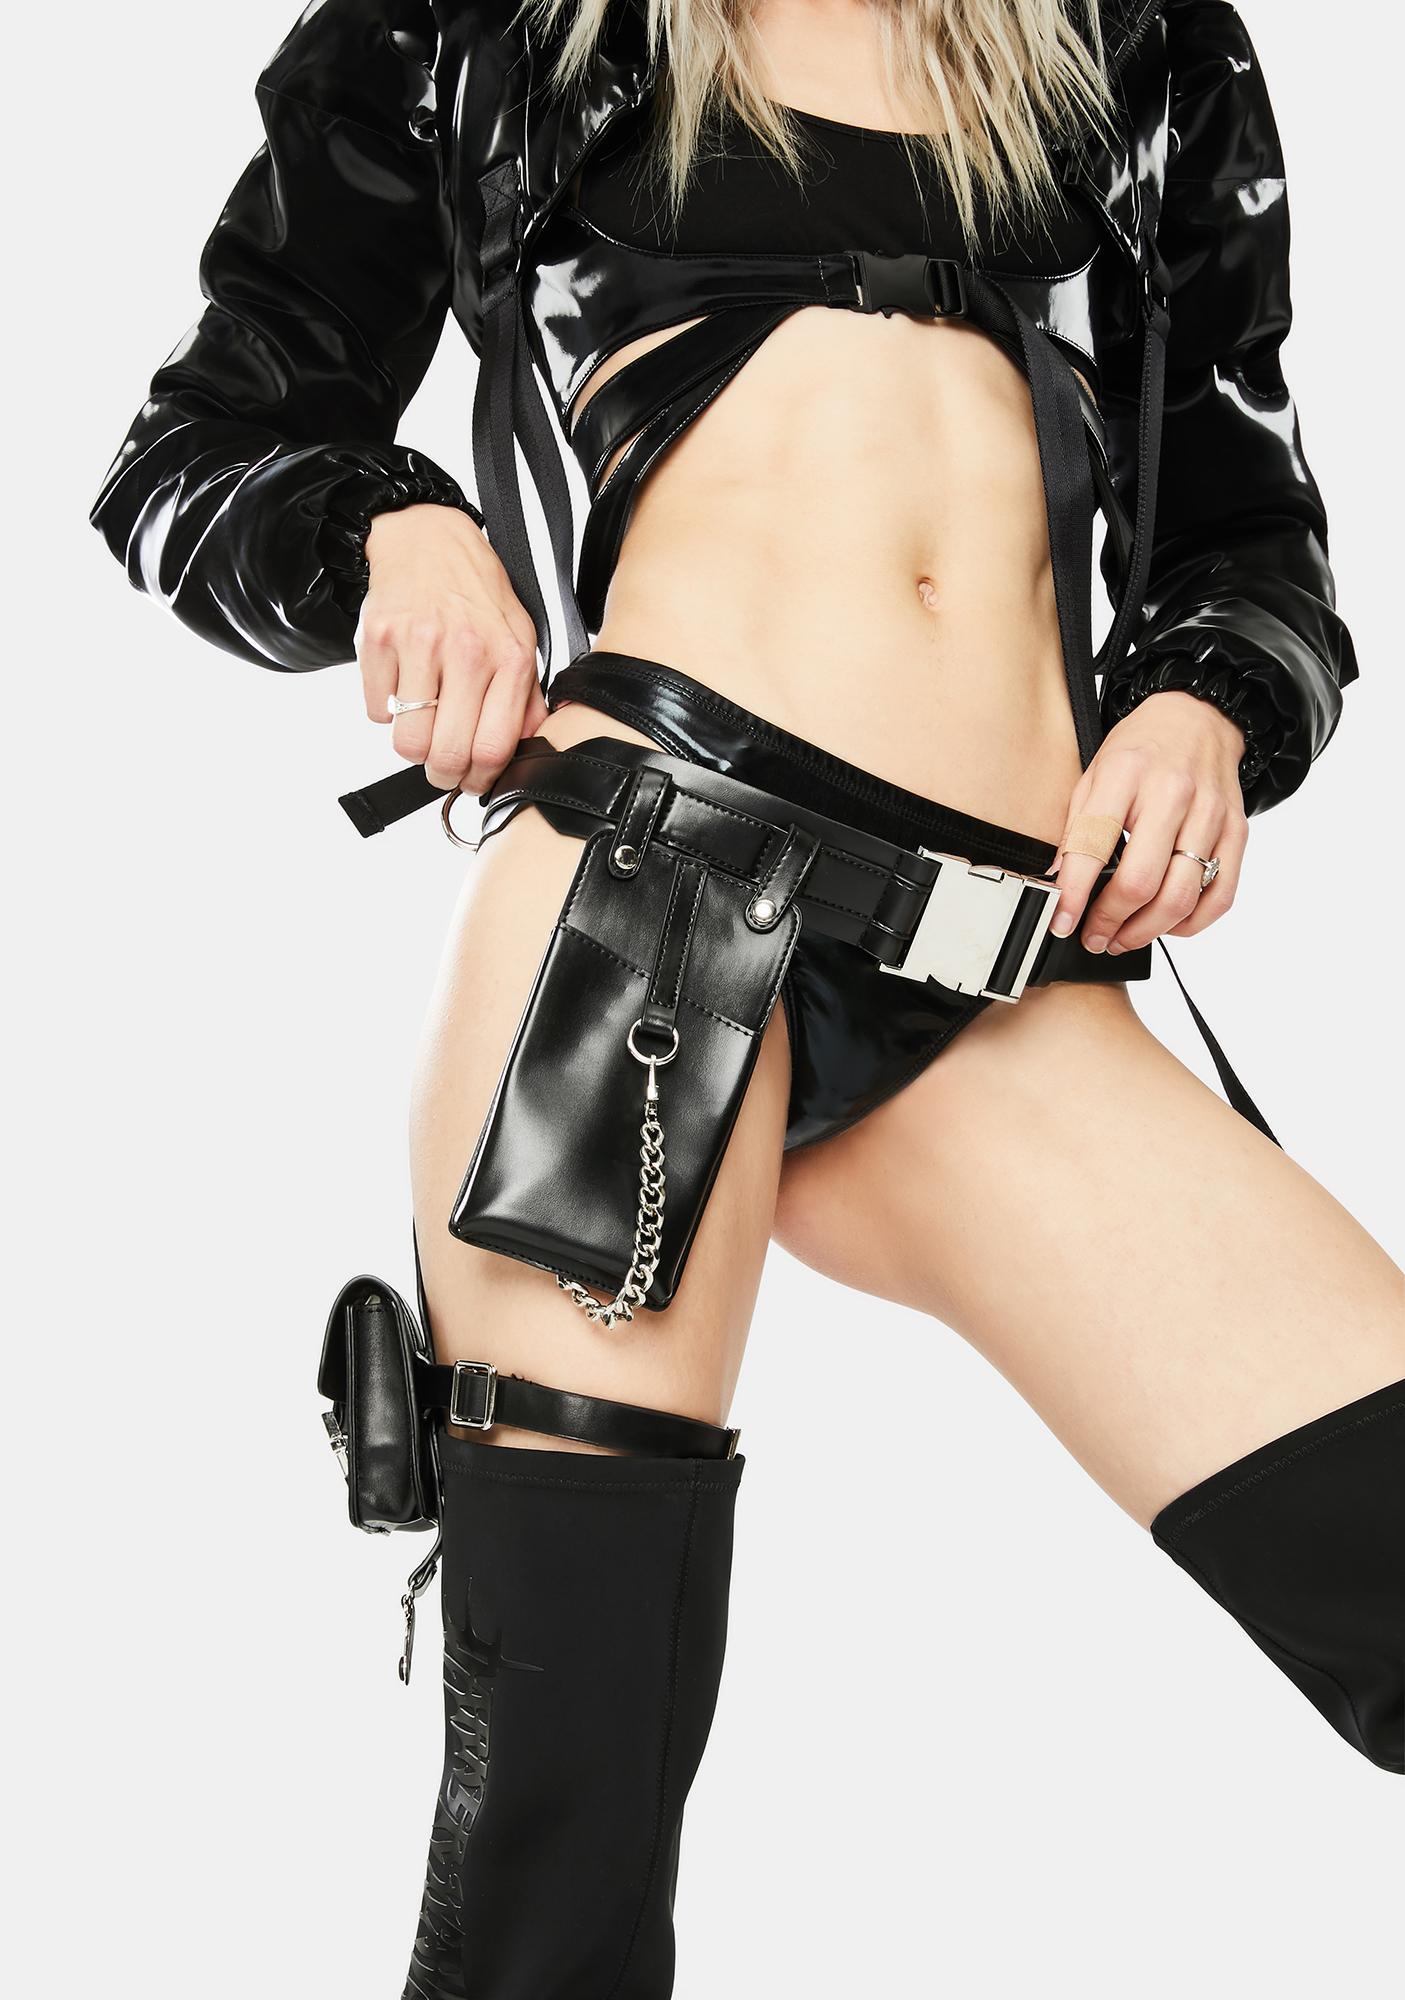 Poster Grl Taking Names Garter Belt Bag